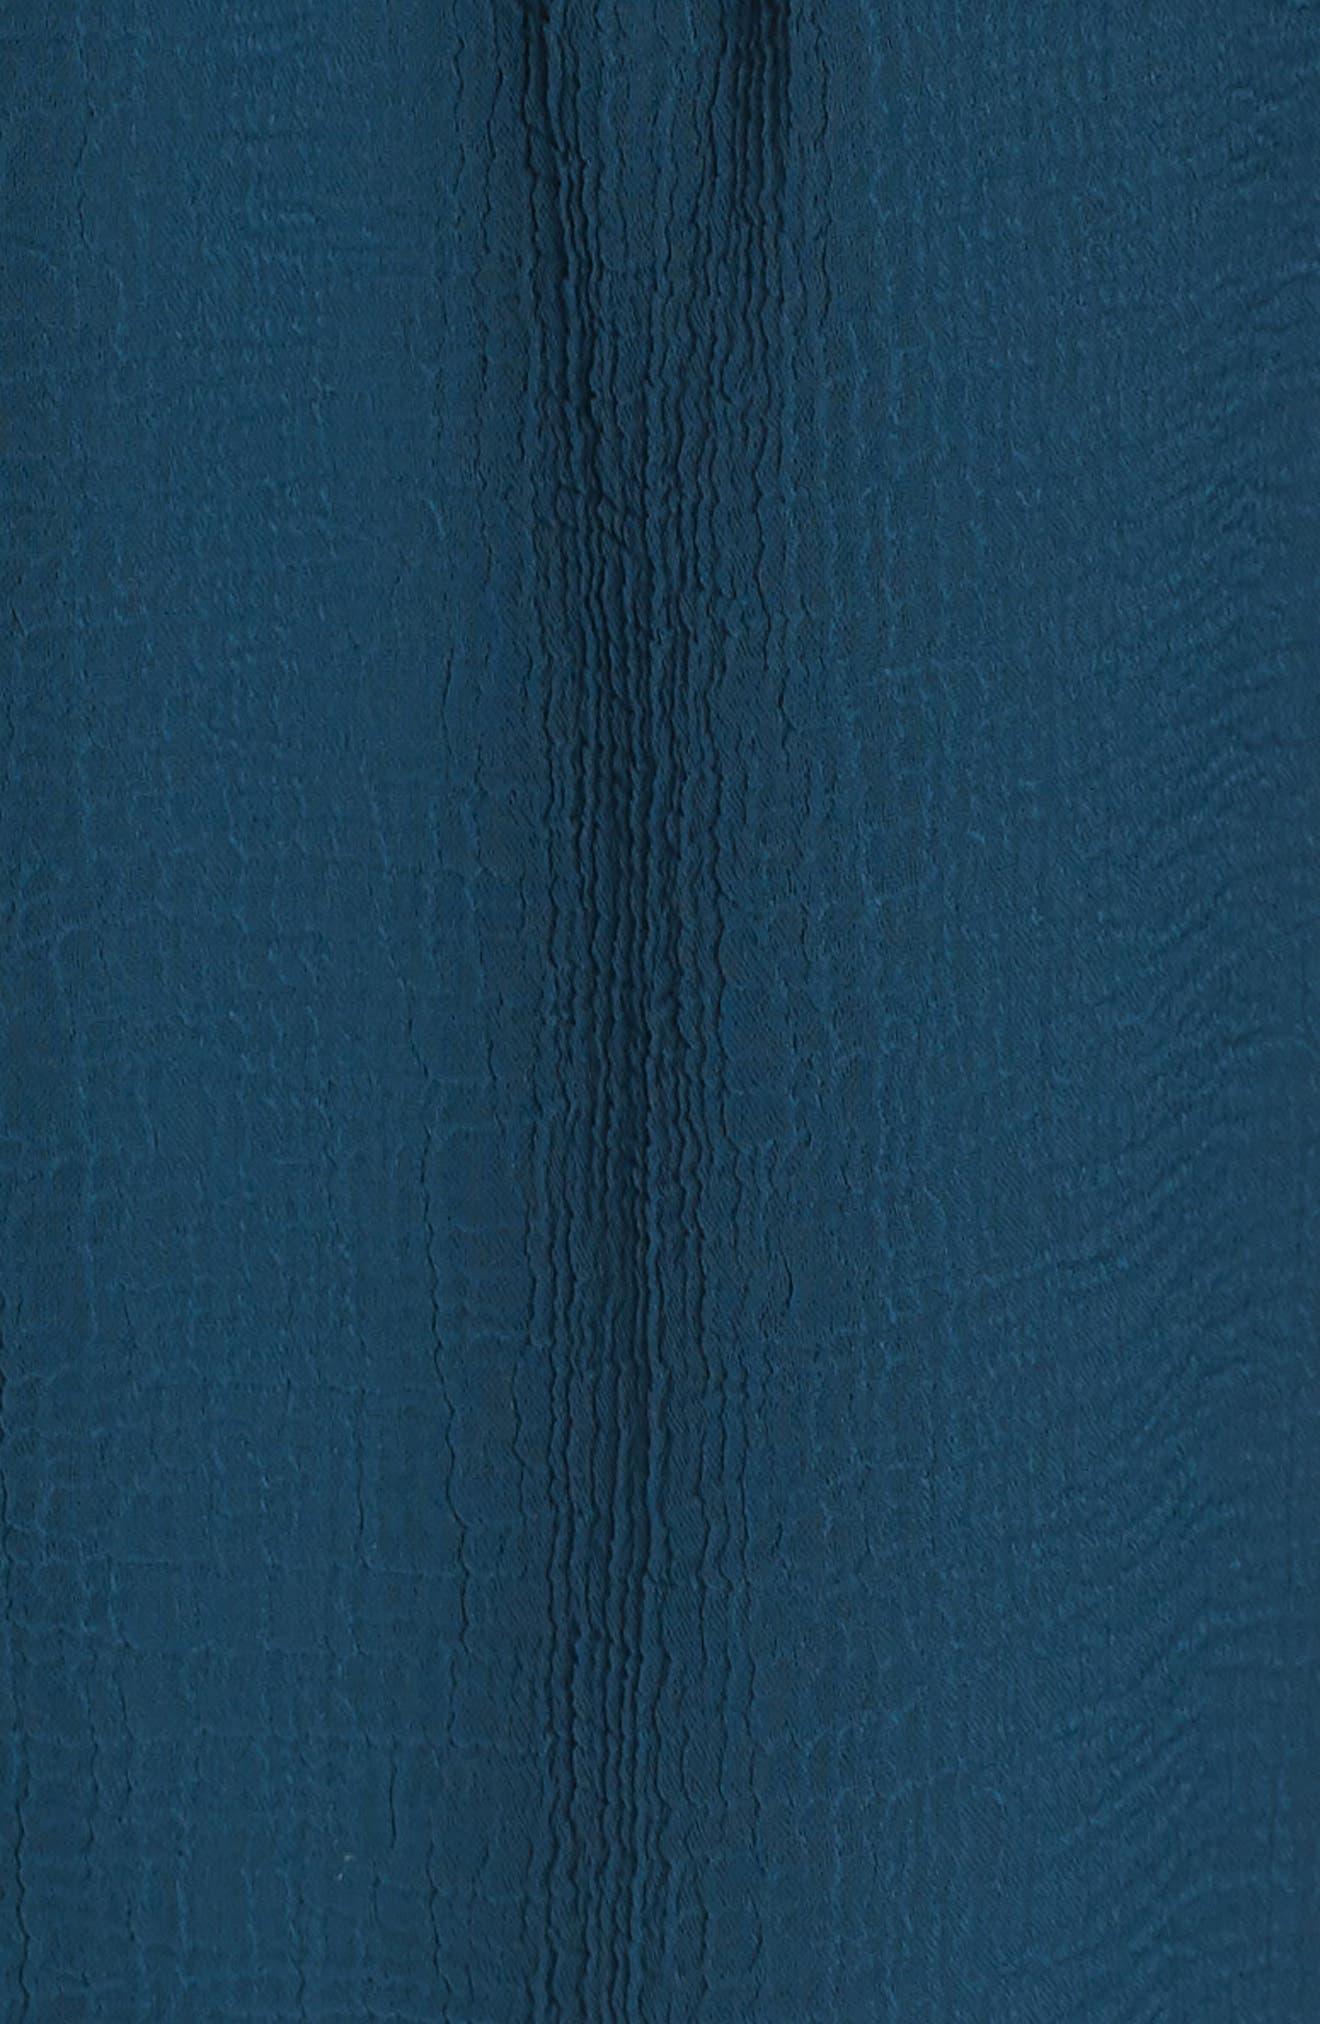 Bishop Sleeve Blouson Dress,                             Alternate thumbnail 6, color,                             441